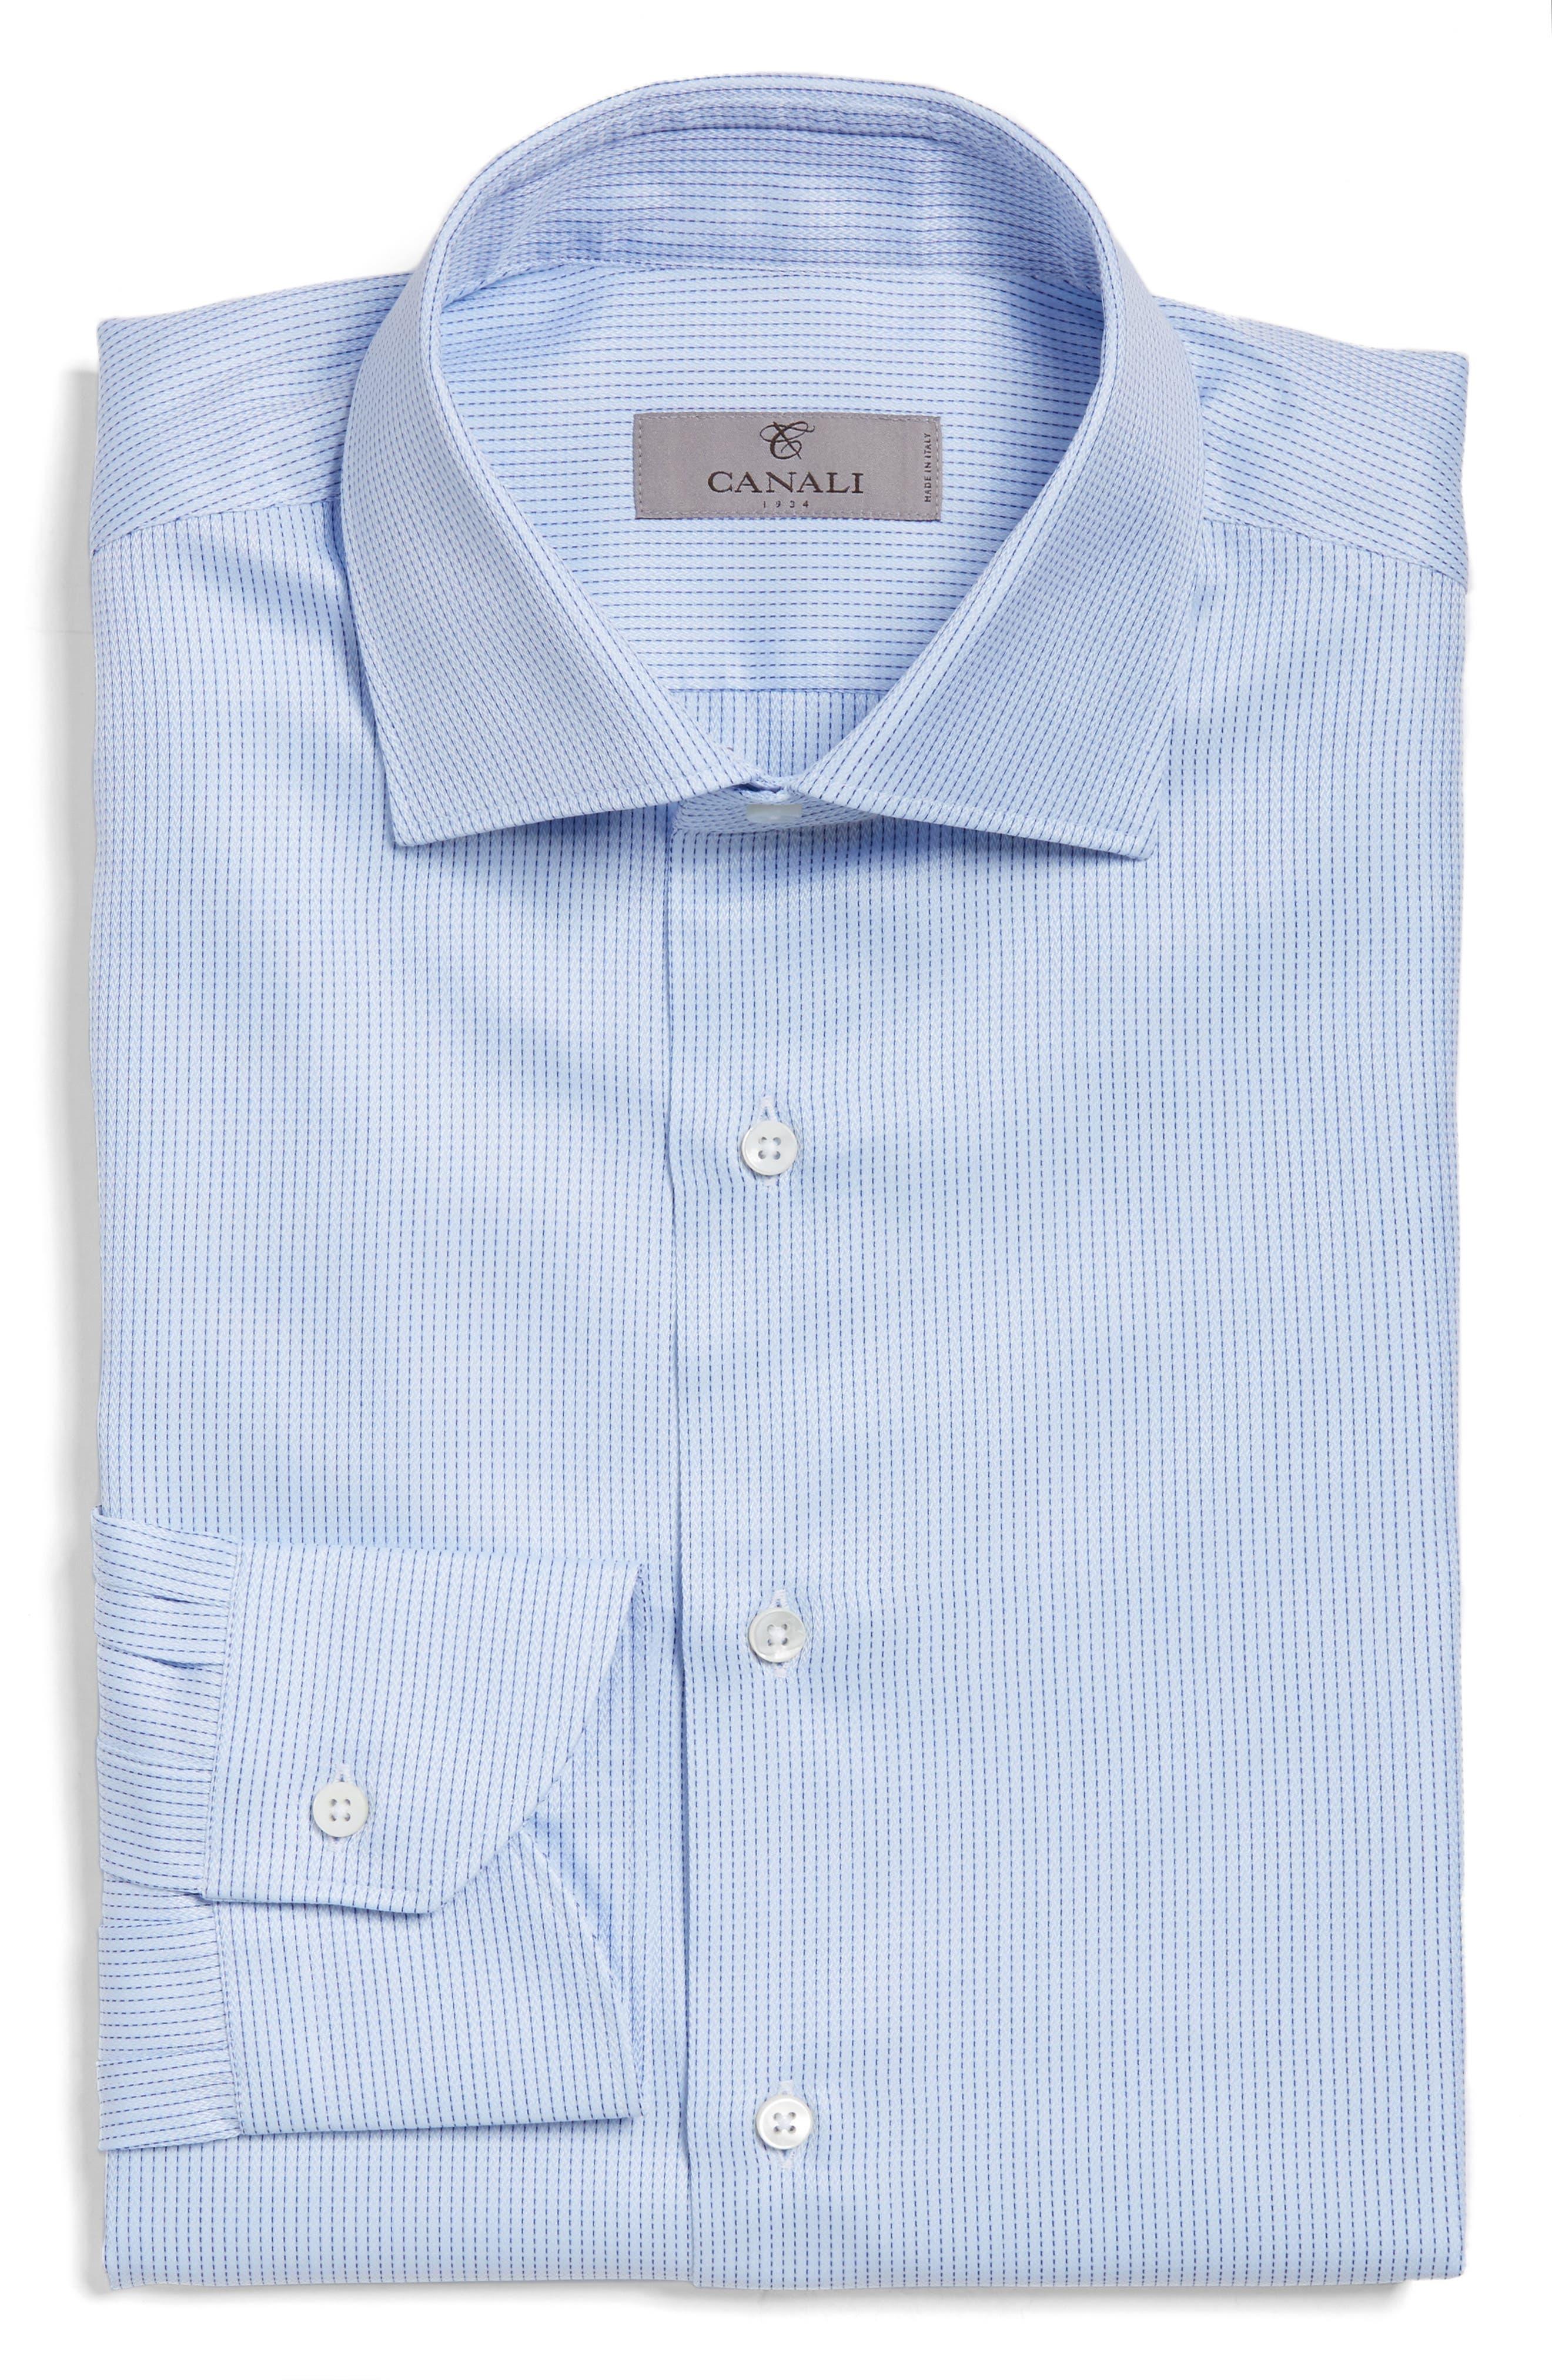 Regular Fit Stripe Dress Shirt,                         Main,                         color, Light Blue